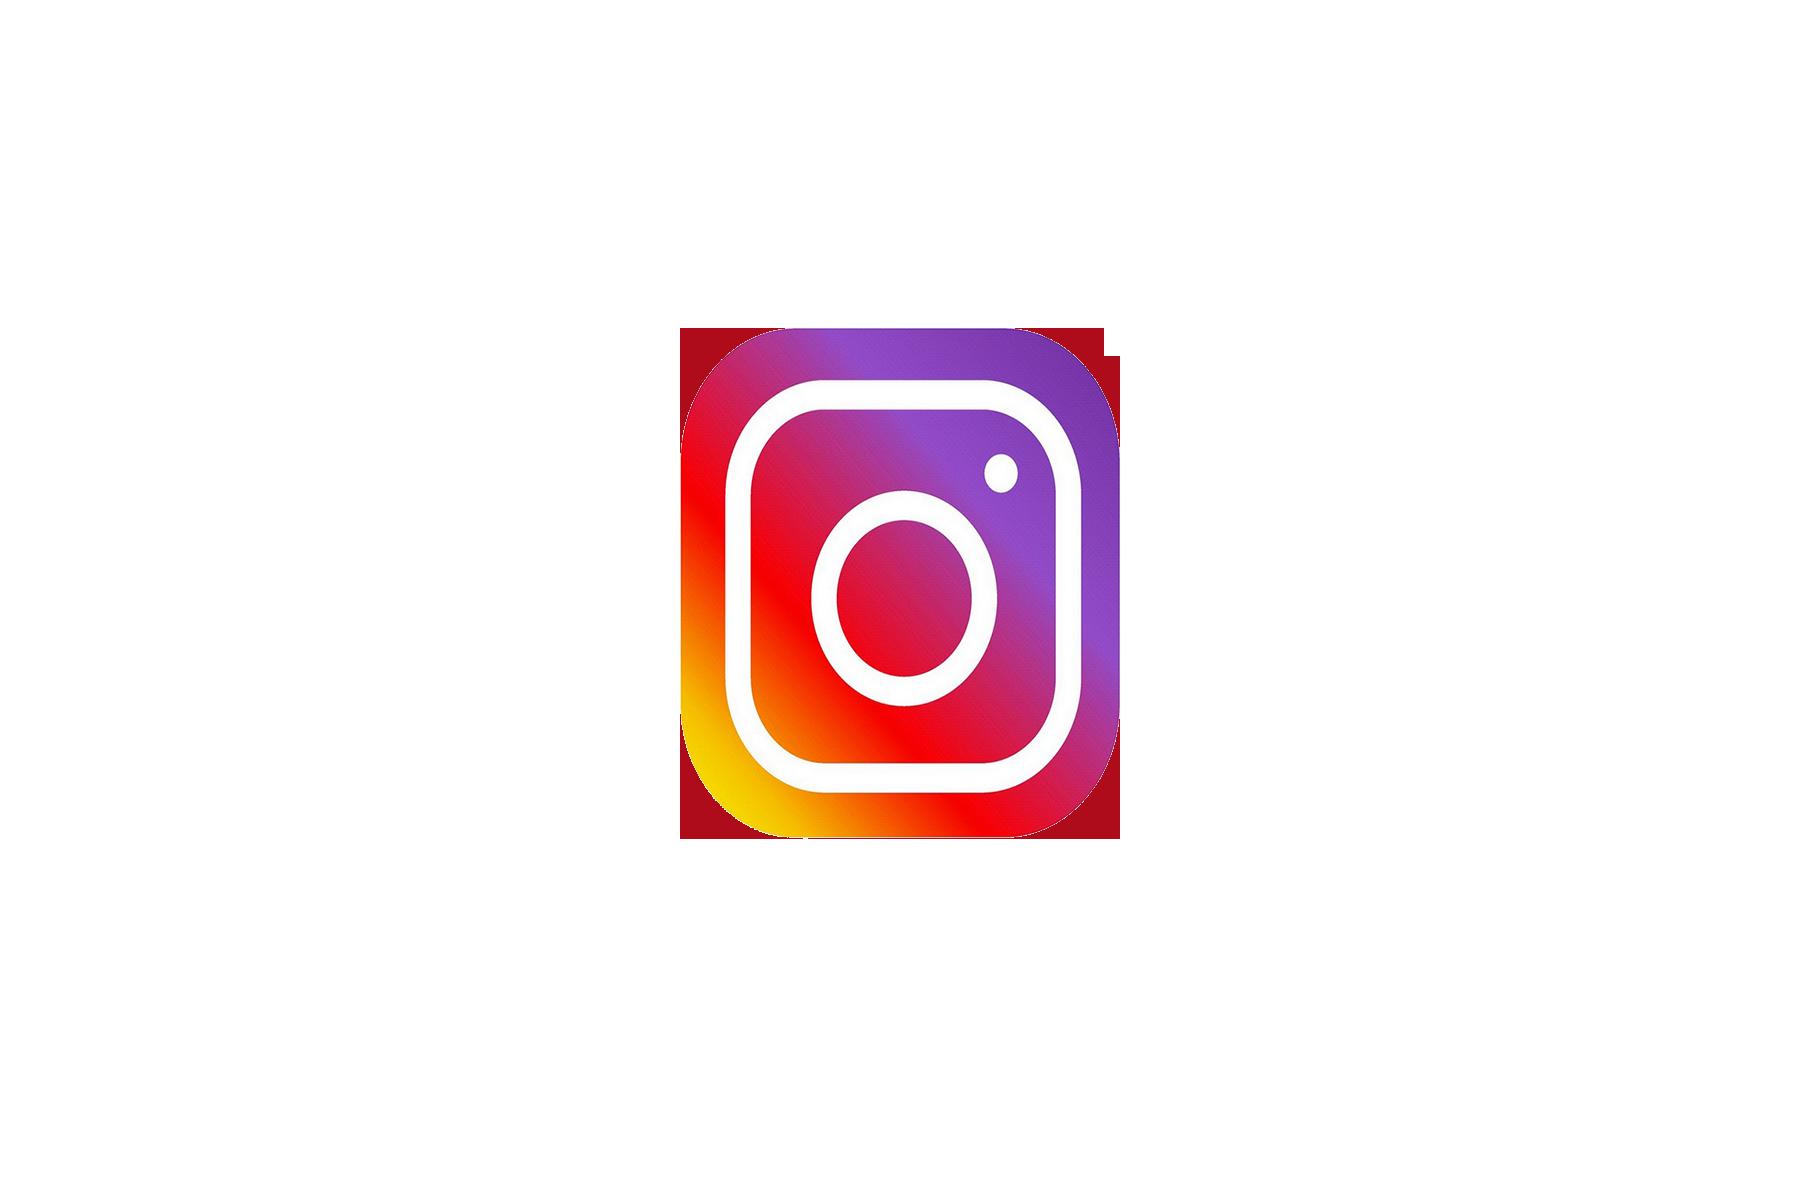 social media logo3.png